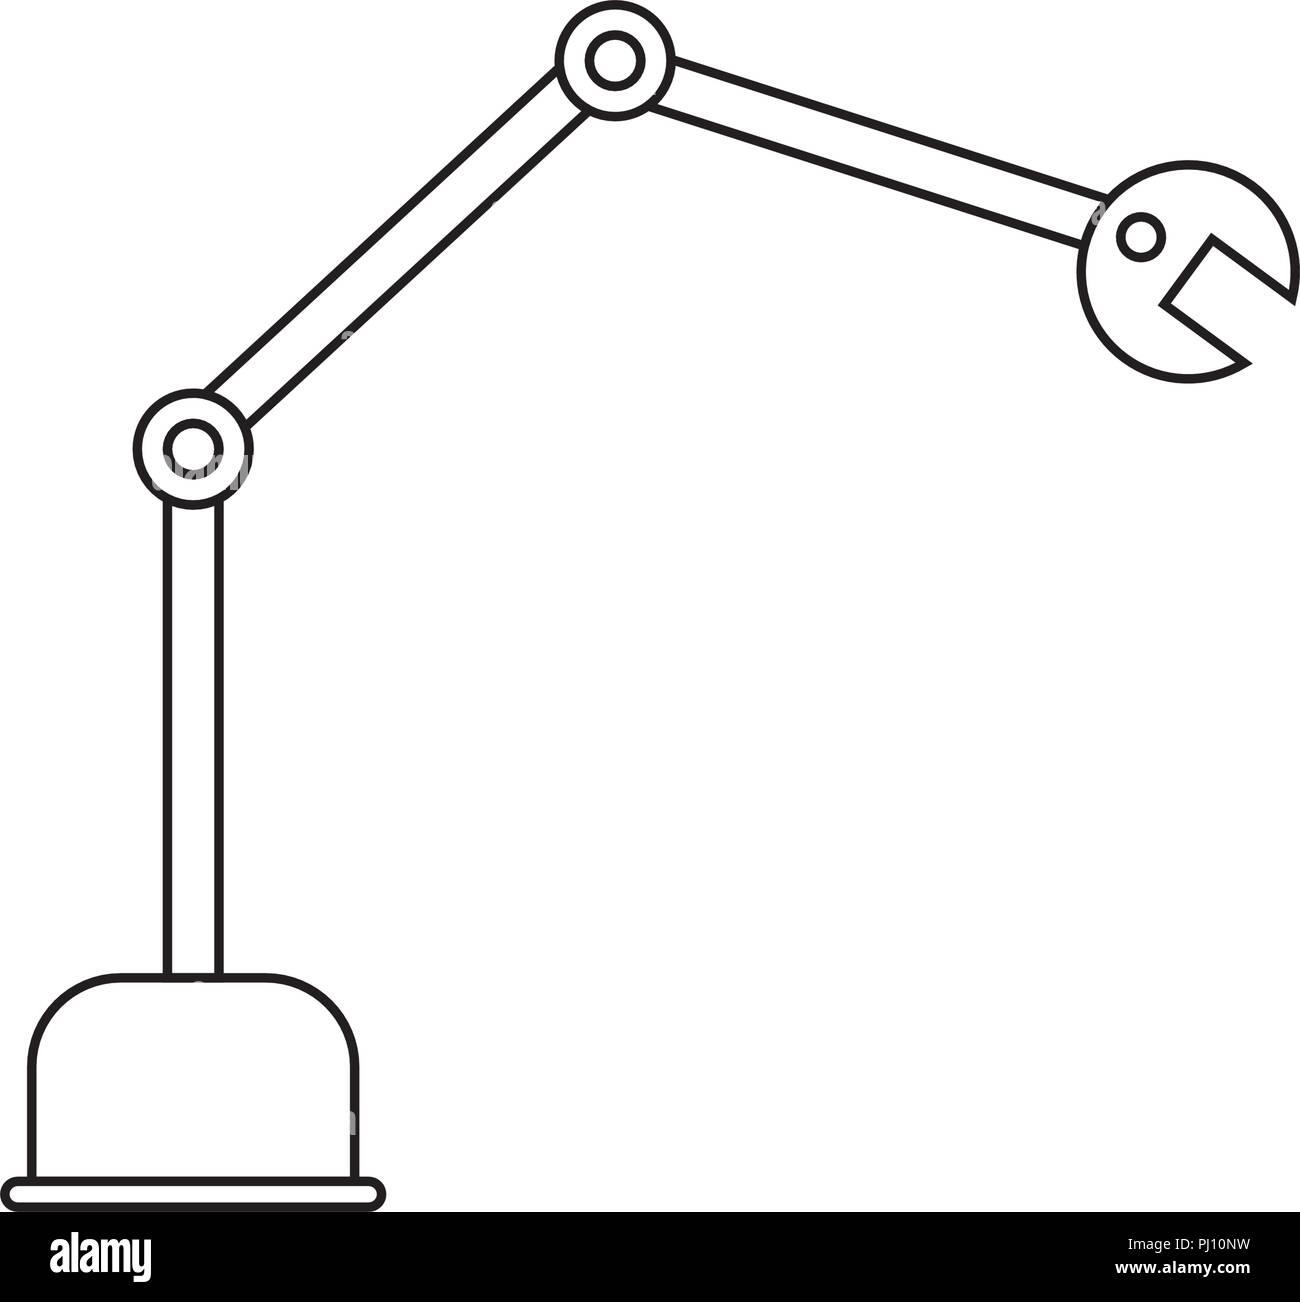 Abstract robot hand - Stock Image